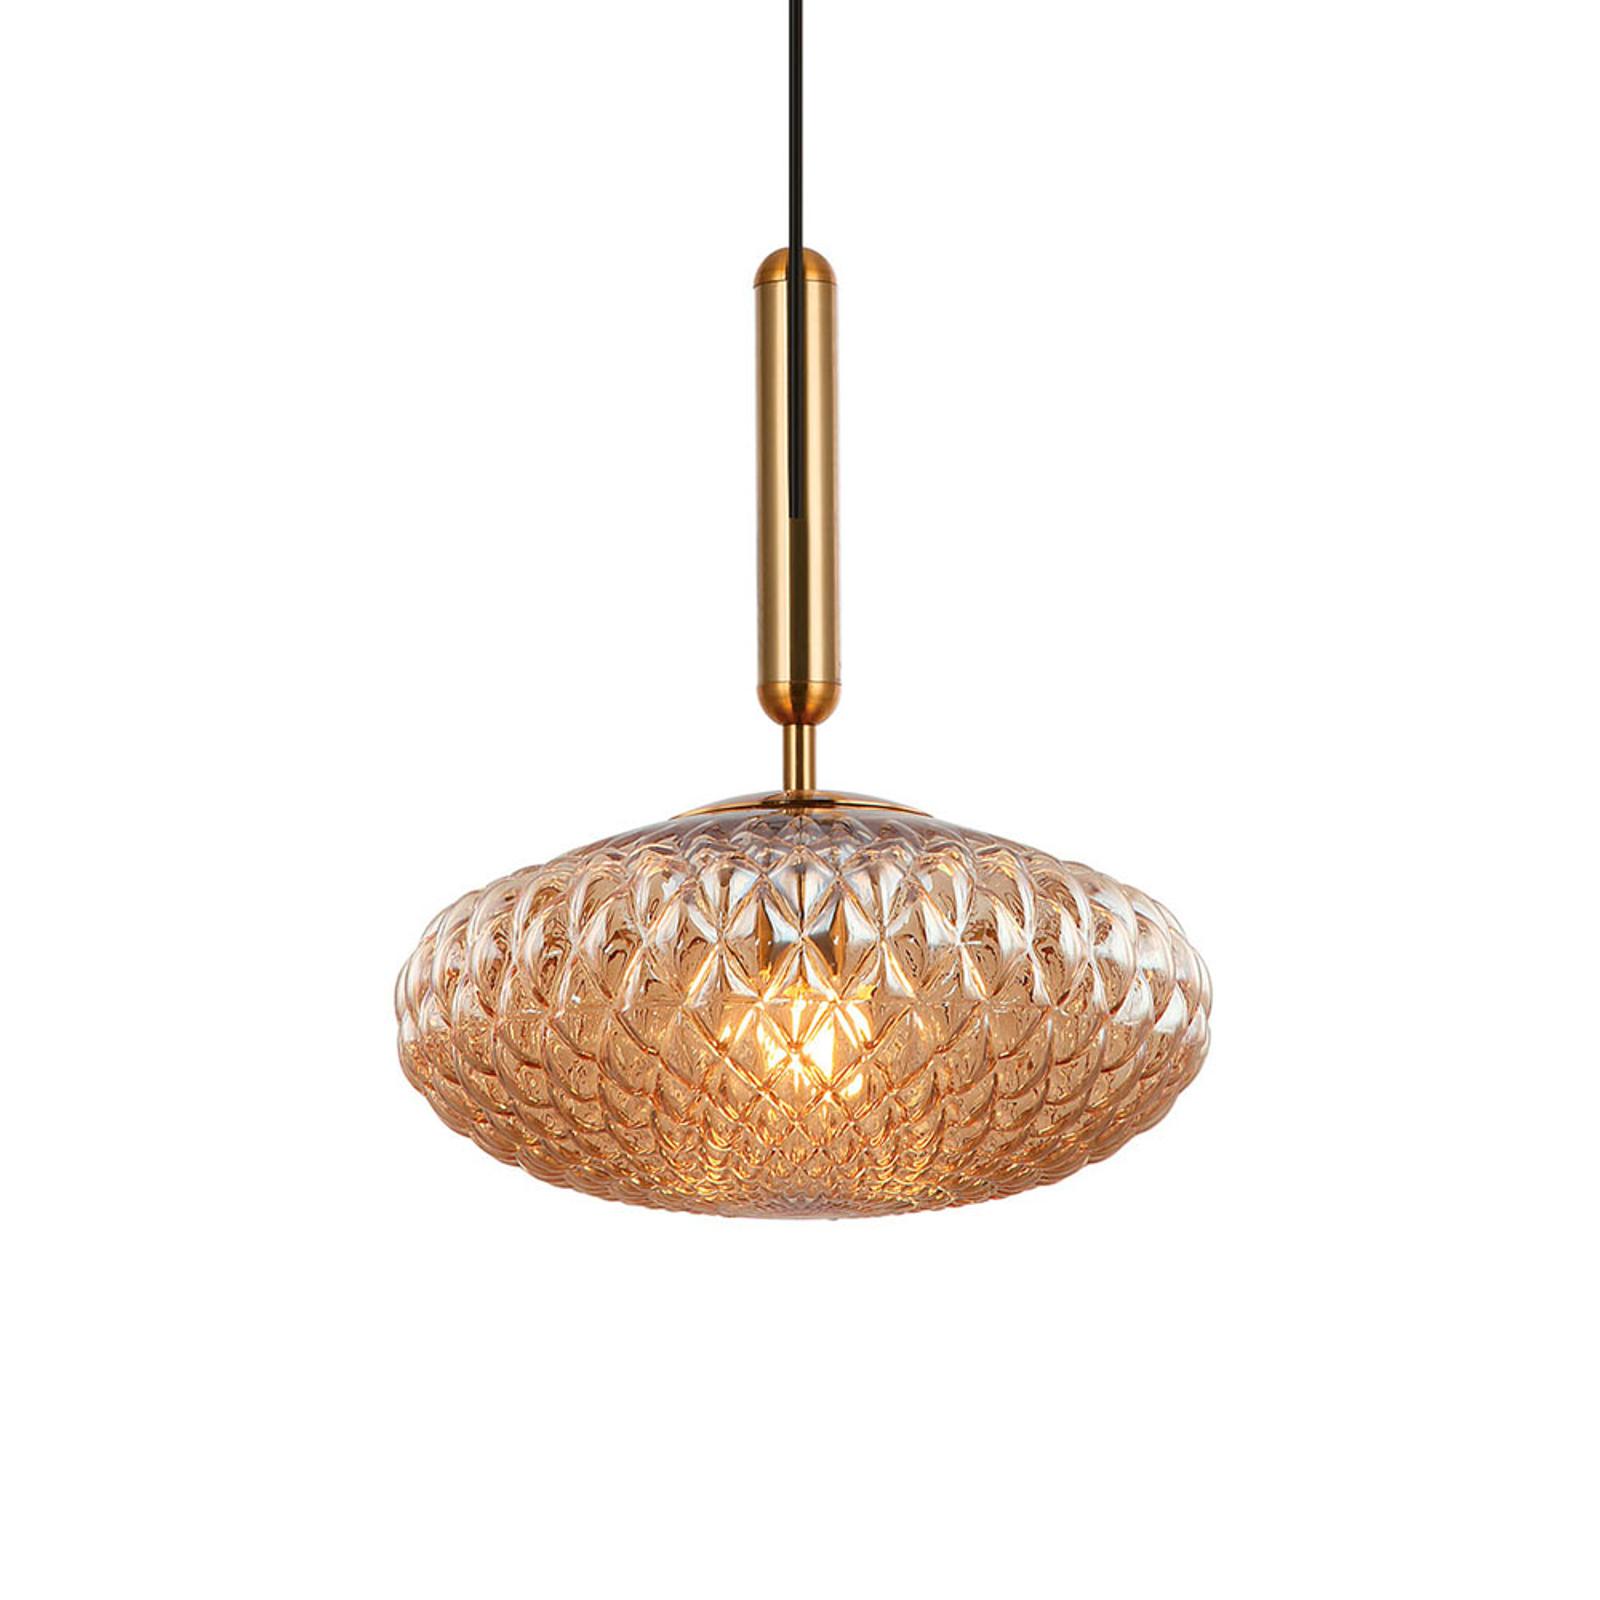 Hanglamp Ester van glas, amber